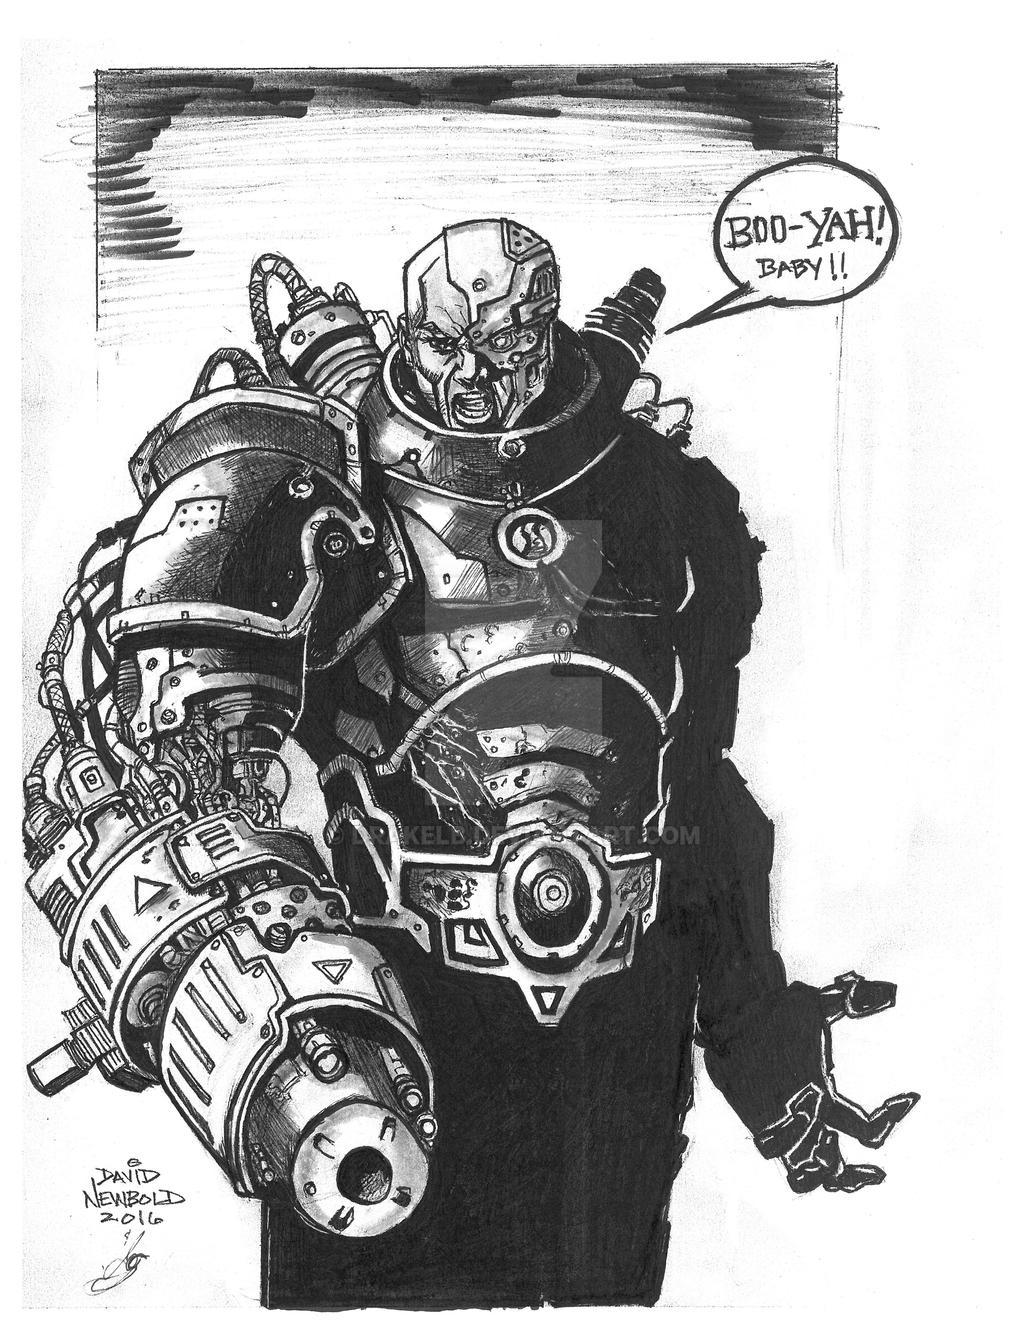 Cyborg by Drakelb